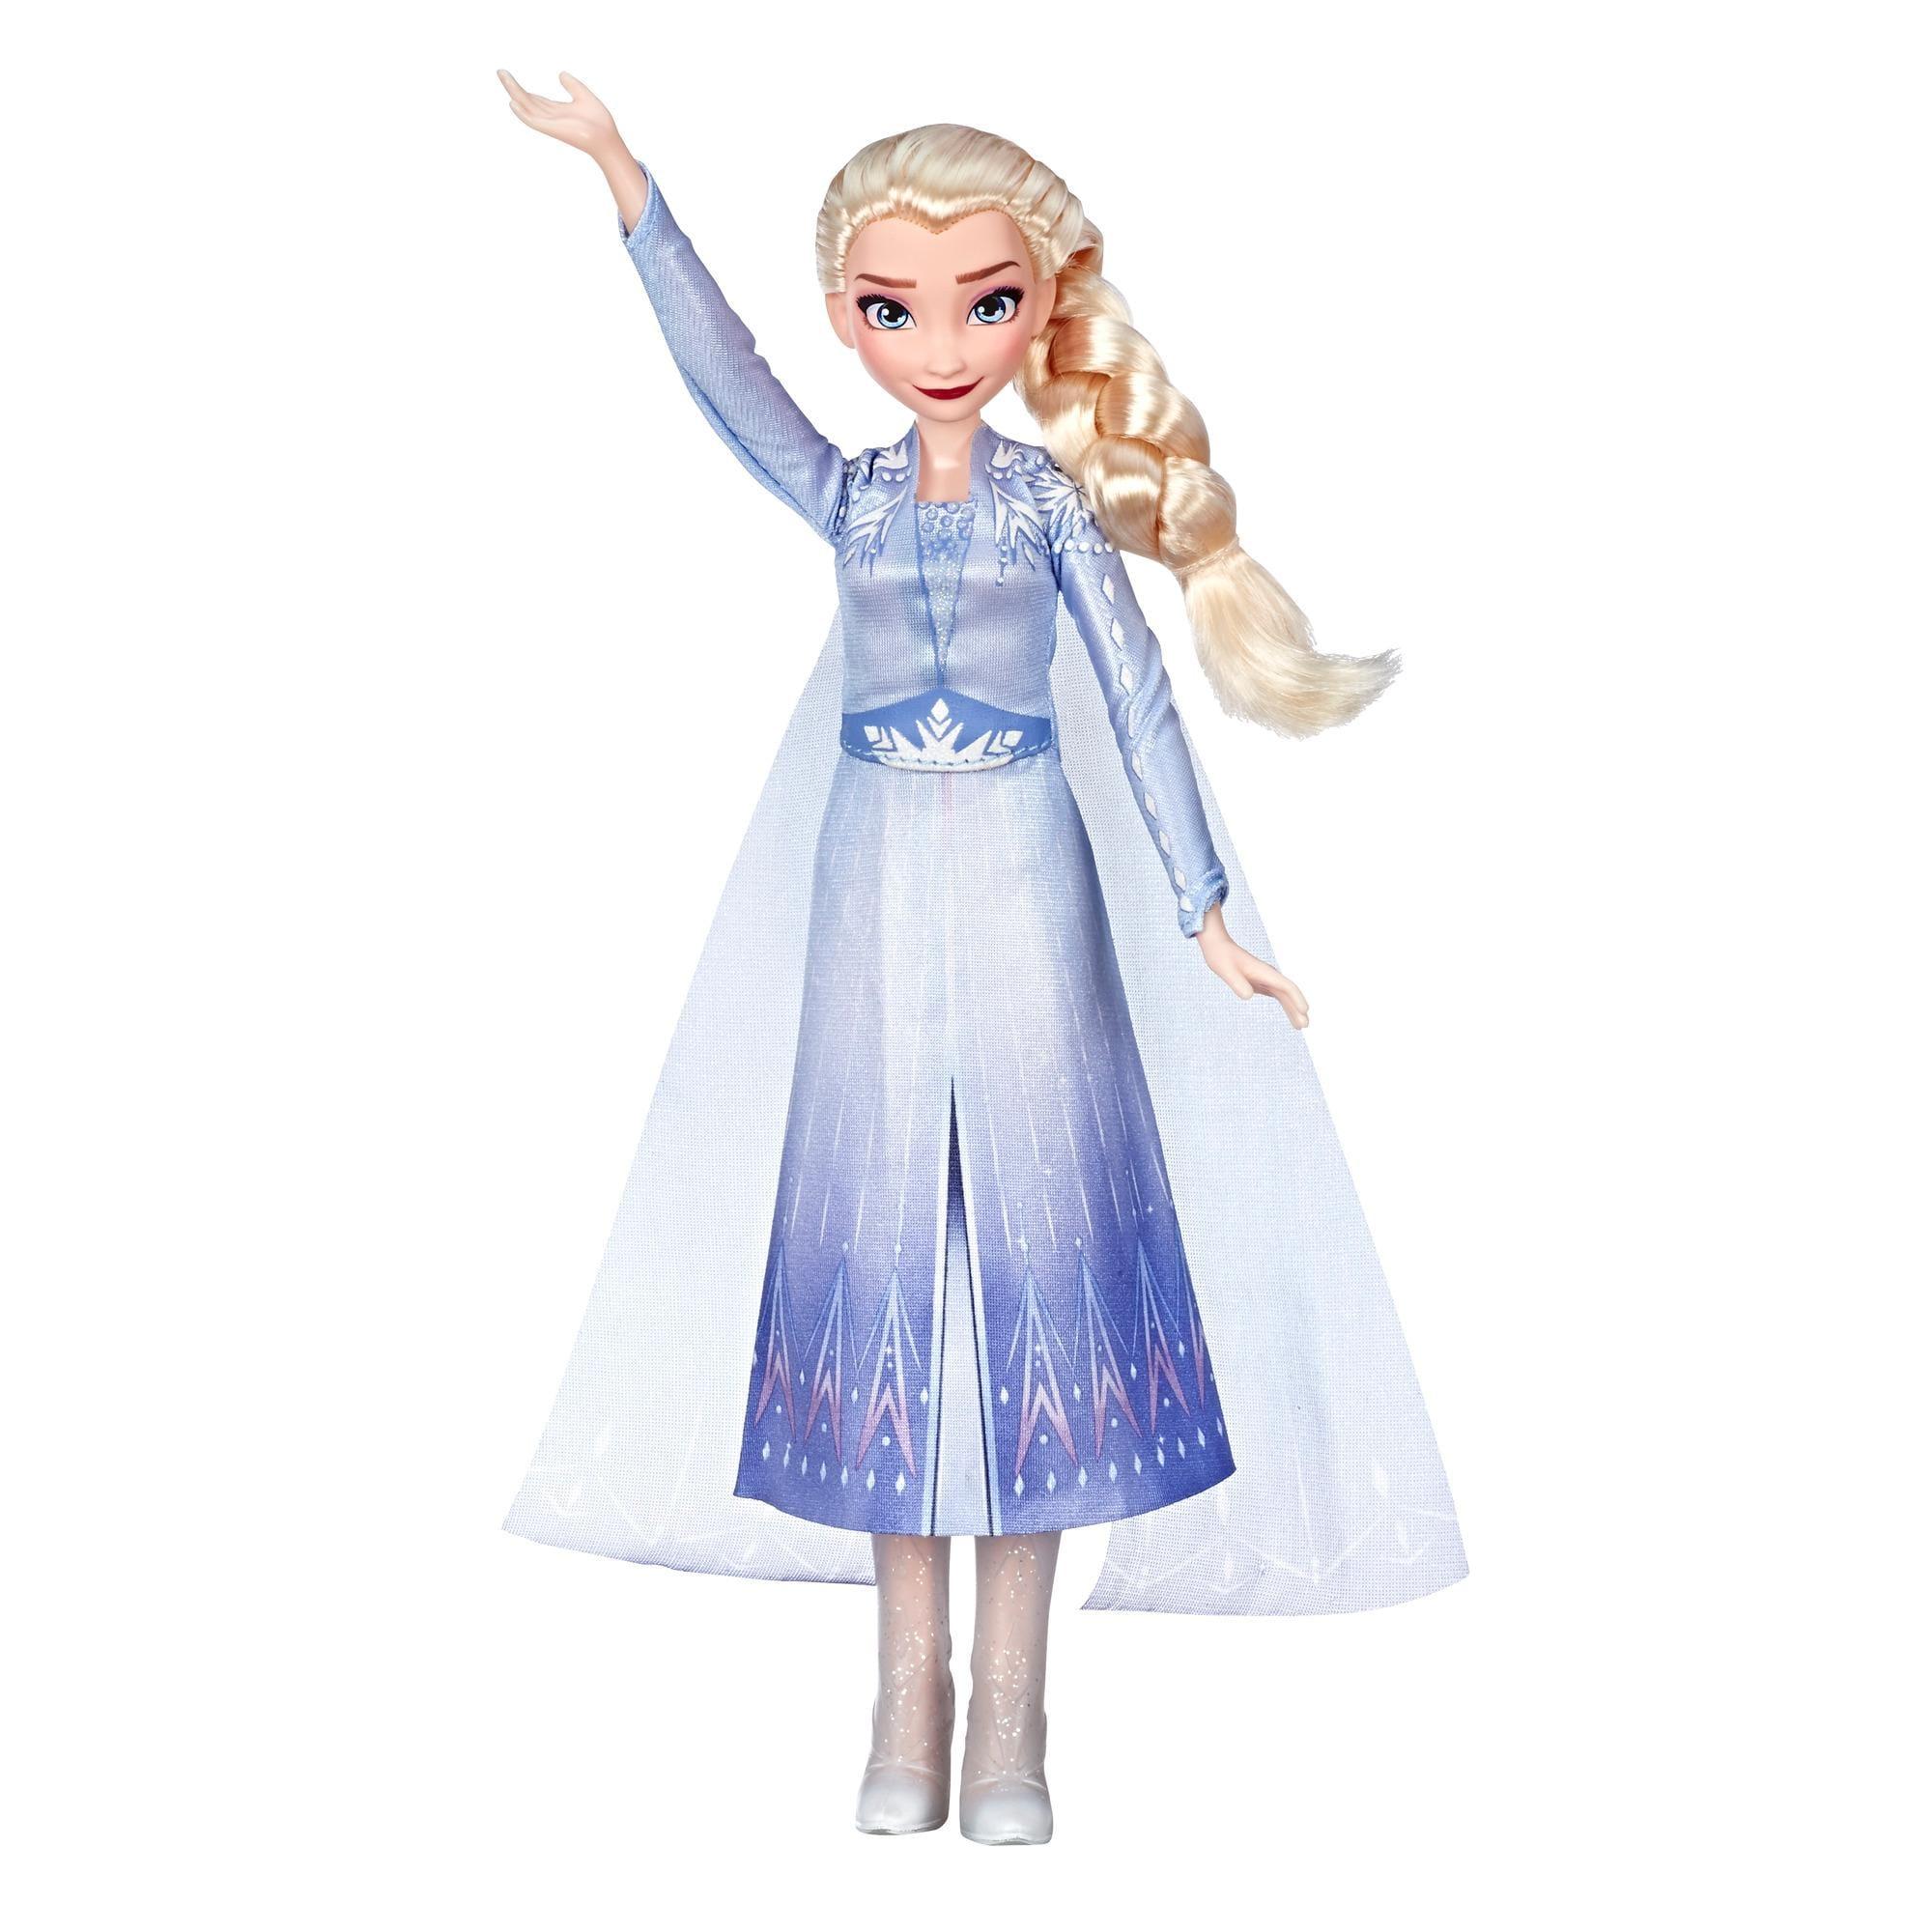 Disney Frozen 2 Singing Elsa and Singing Anna